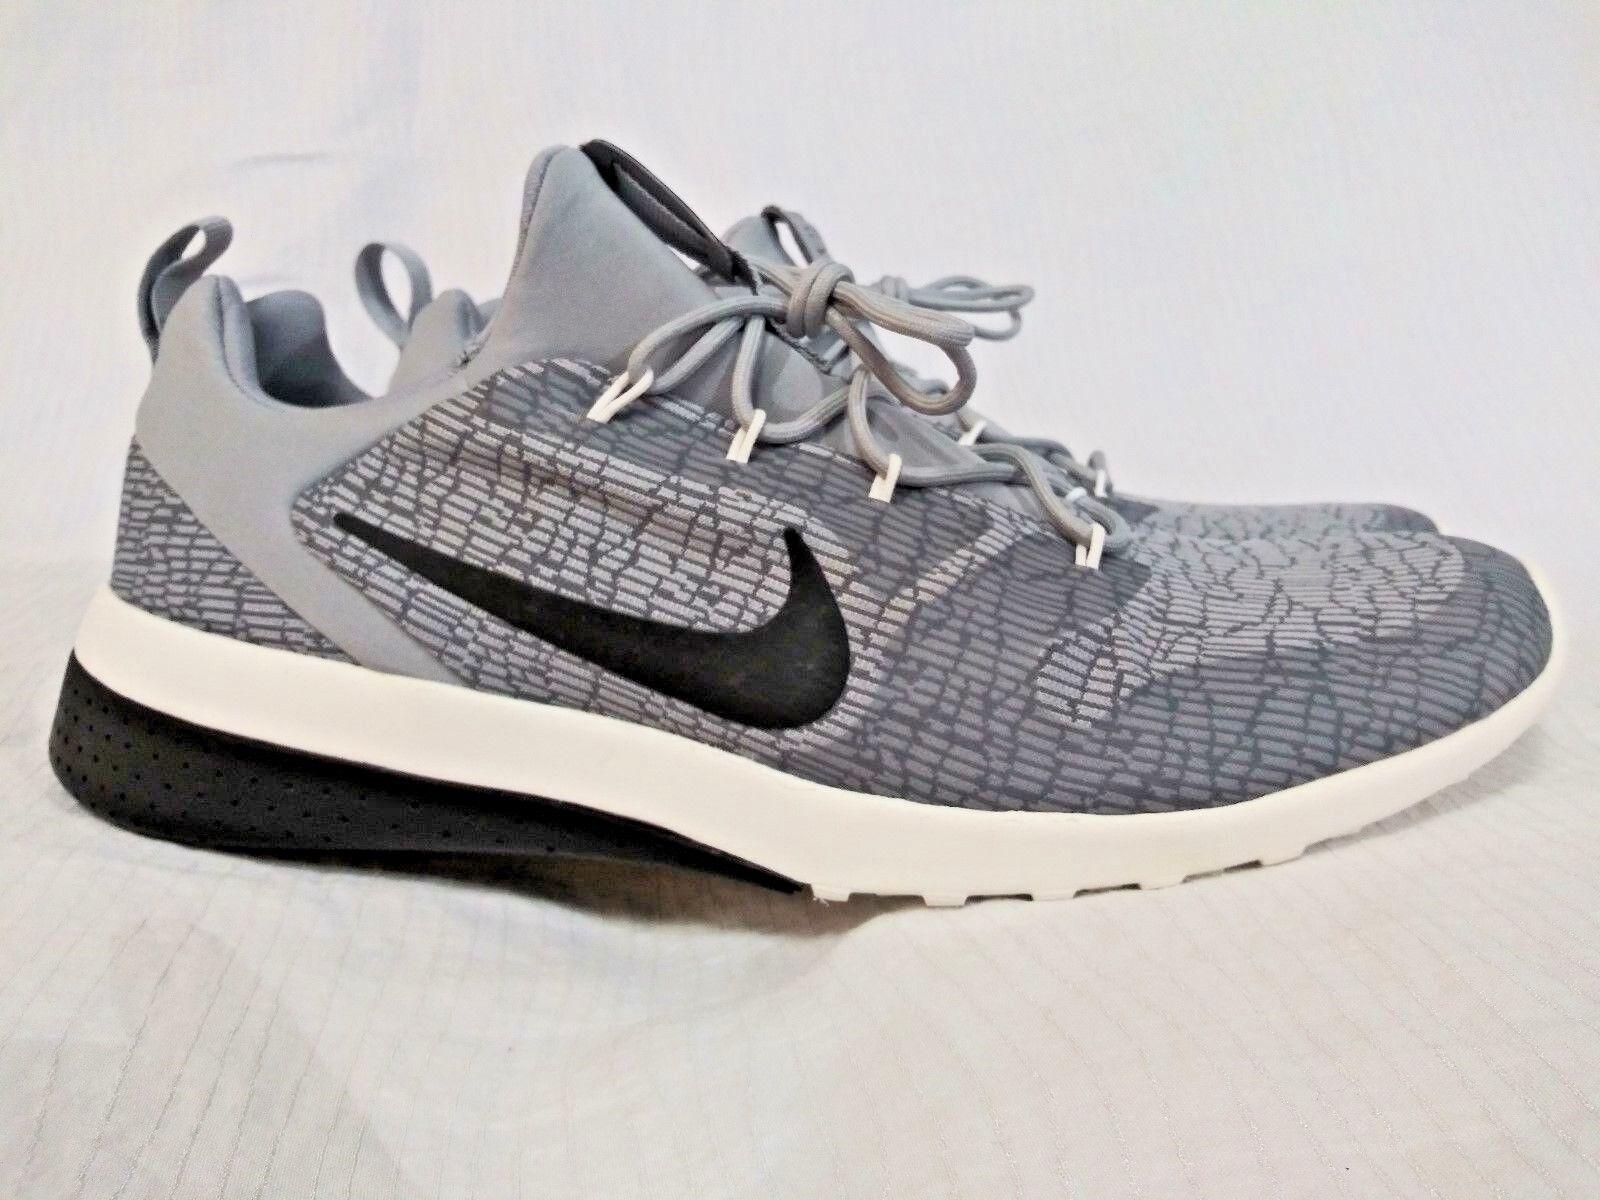 Nike Shoes Men's CK Racer Size 10 cool grey black wolf grey  916780 003